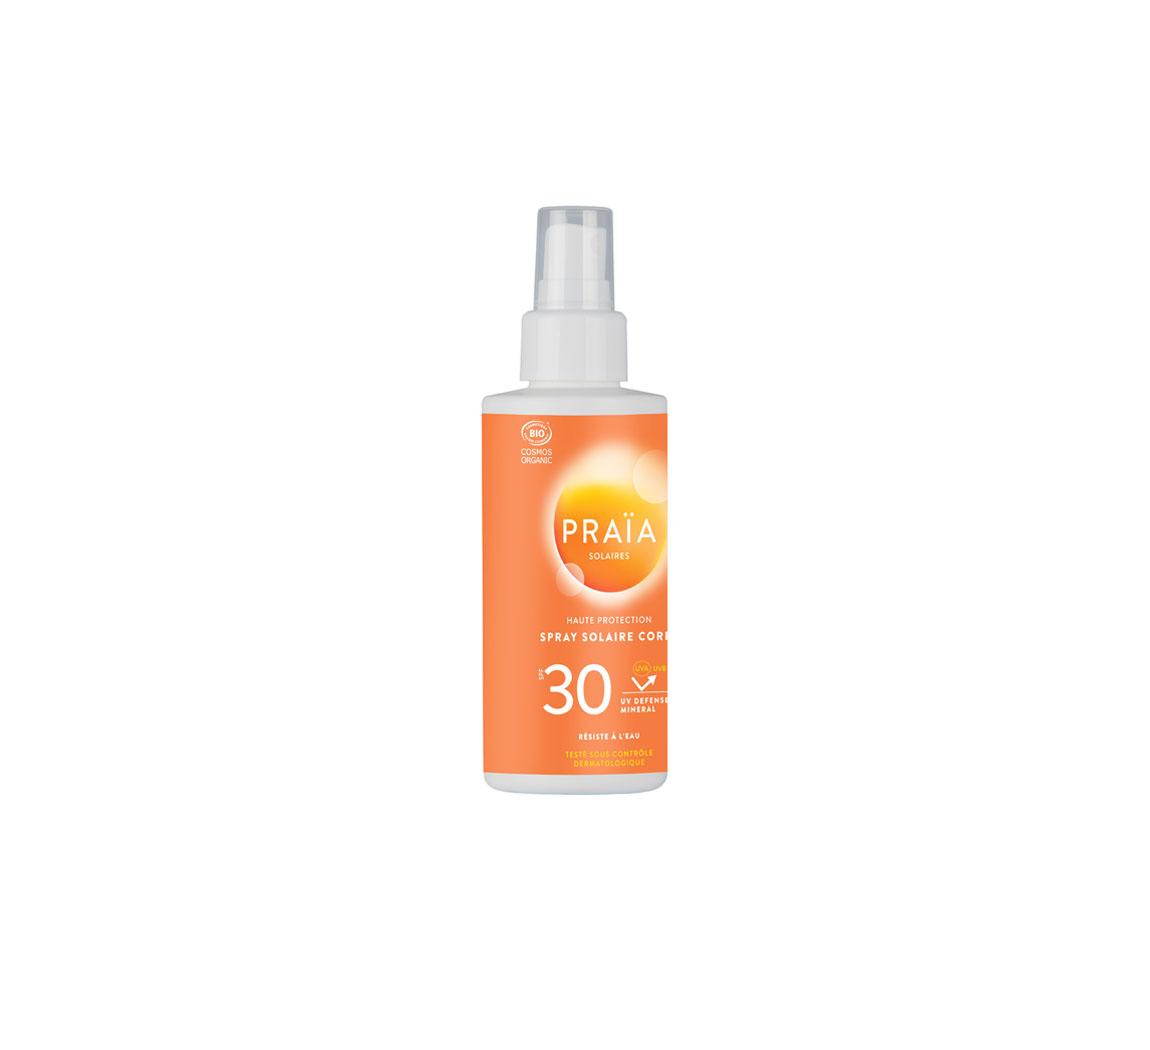 Spray solaire corps Spray solaire SPF30